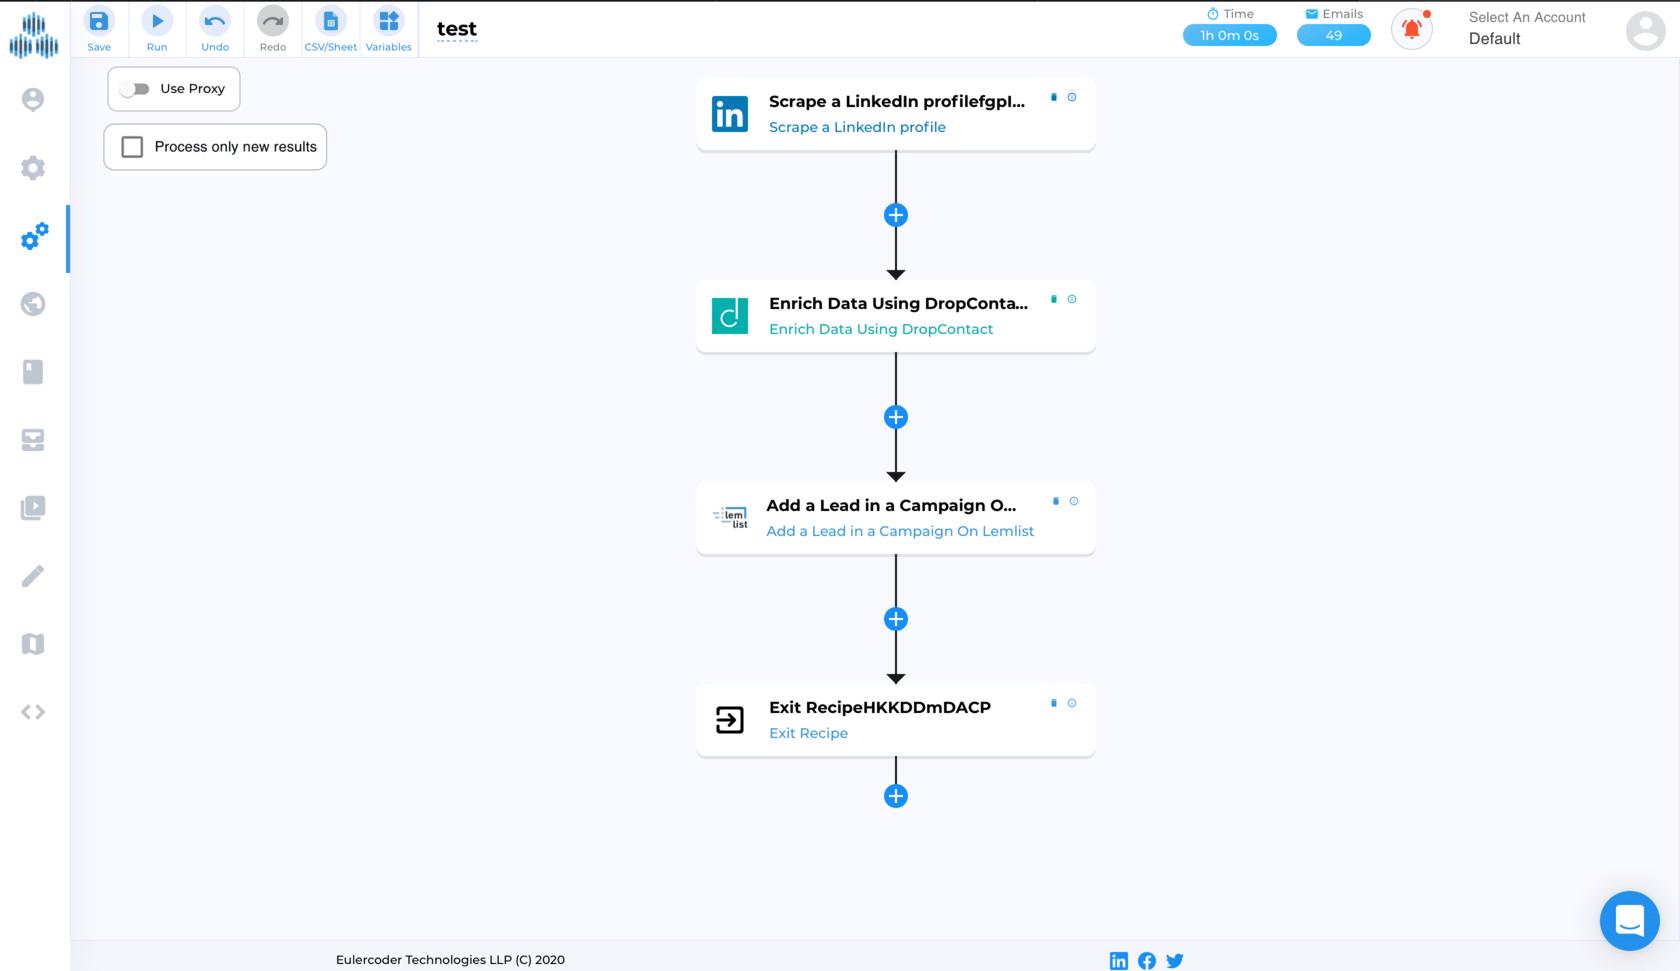 TexAu: Automate multichannel LinkedIn prospecting